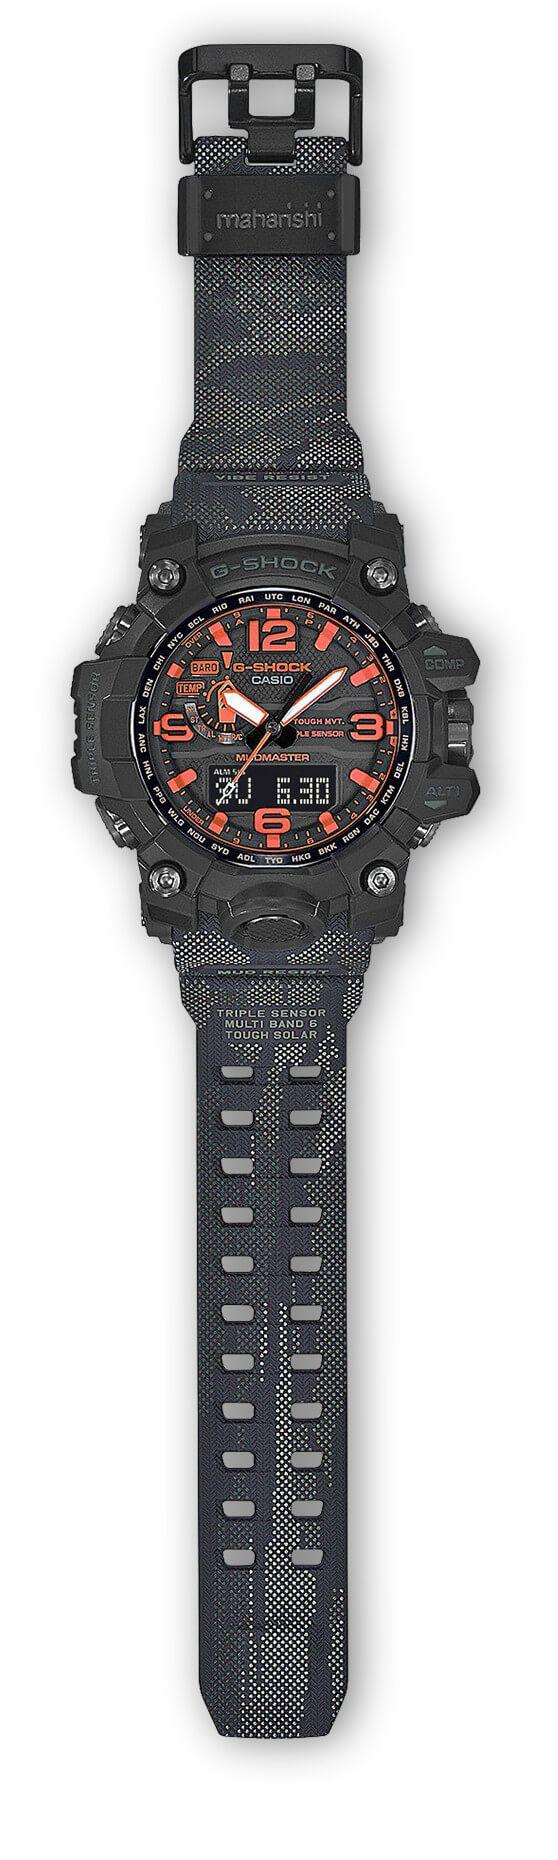 Maharishi x G-Shock Mudmaster GWG-1000MH-1A